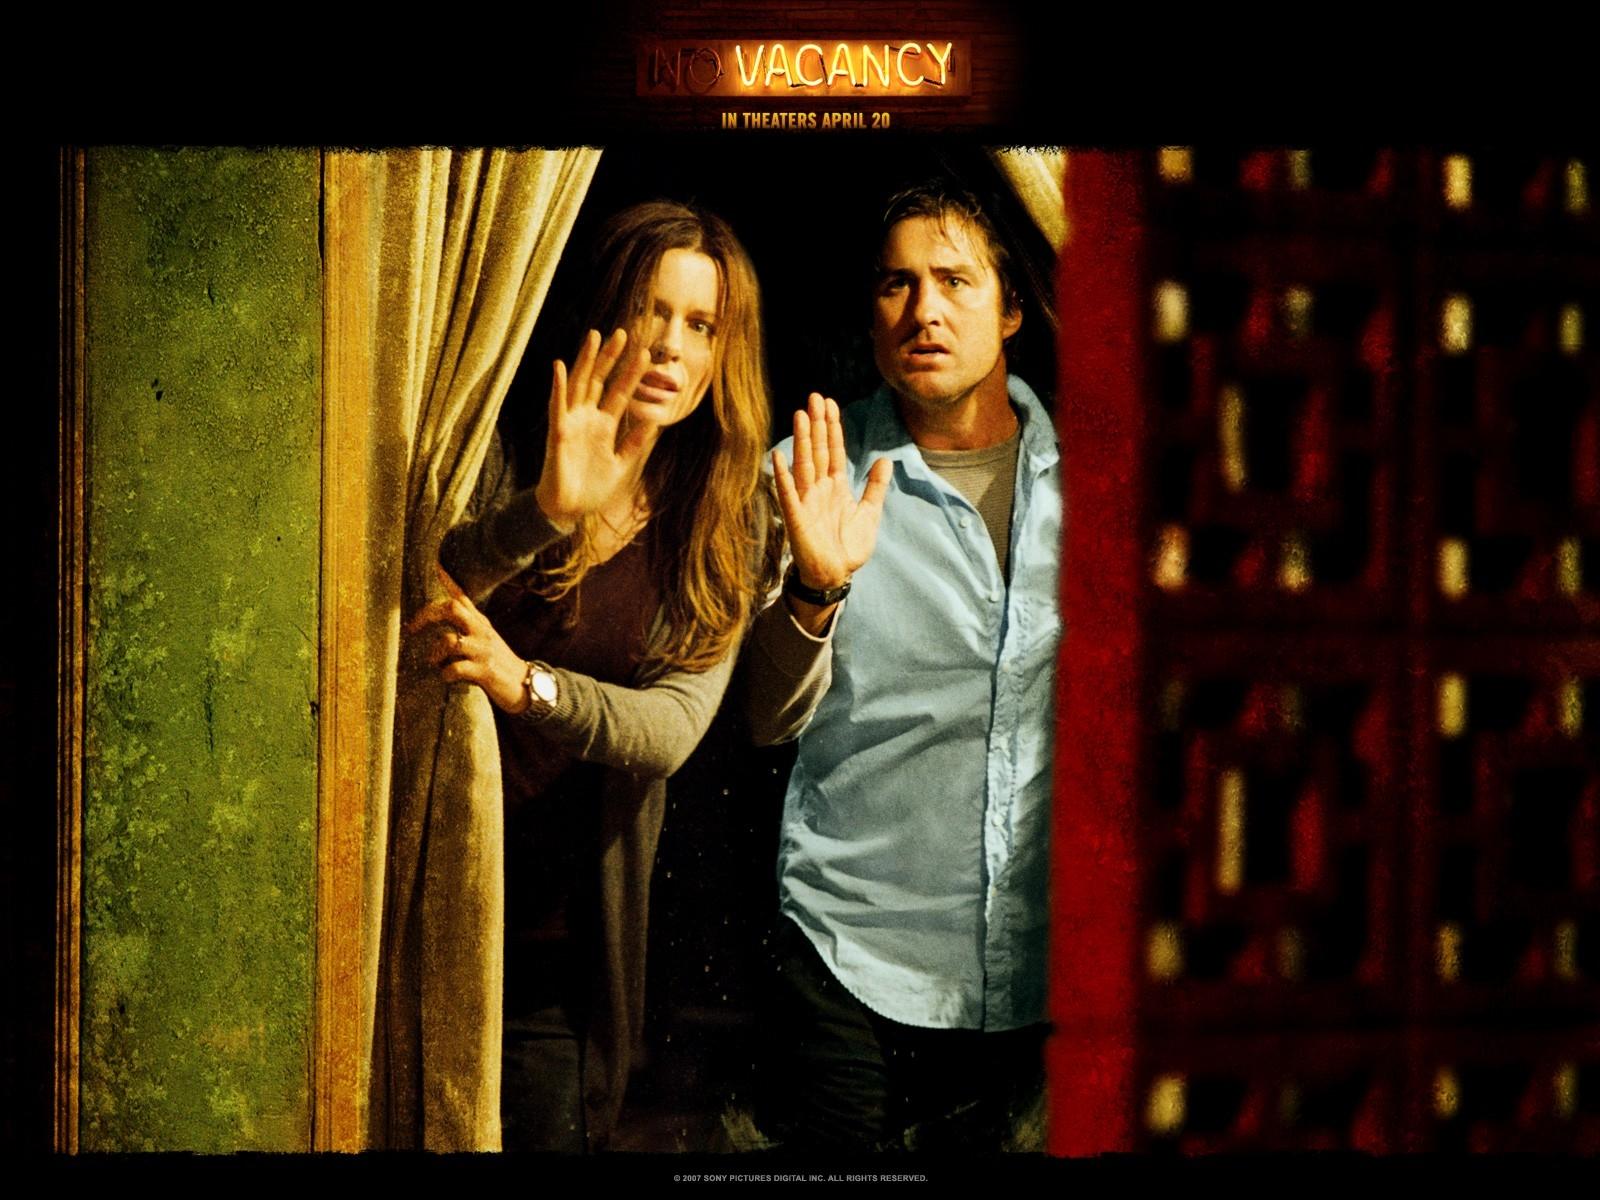 Wallpaper del film Vacancy con Wilson e la Beckinsale